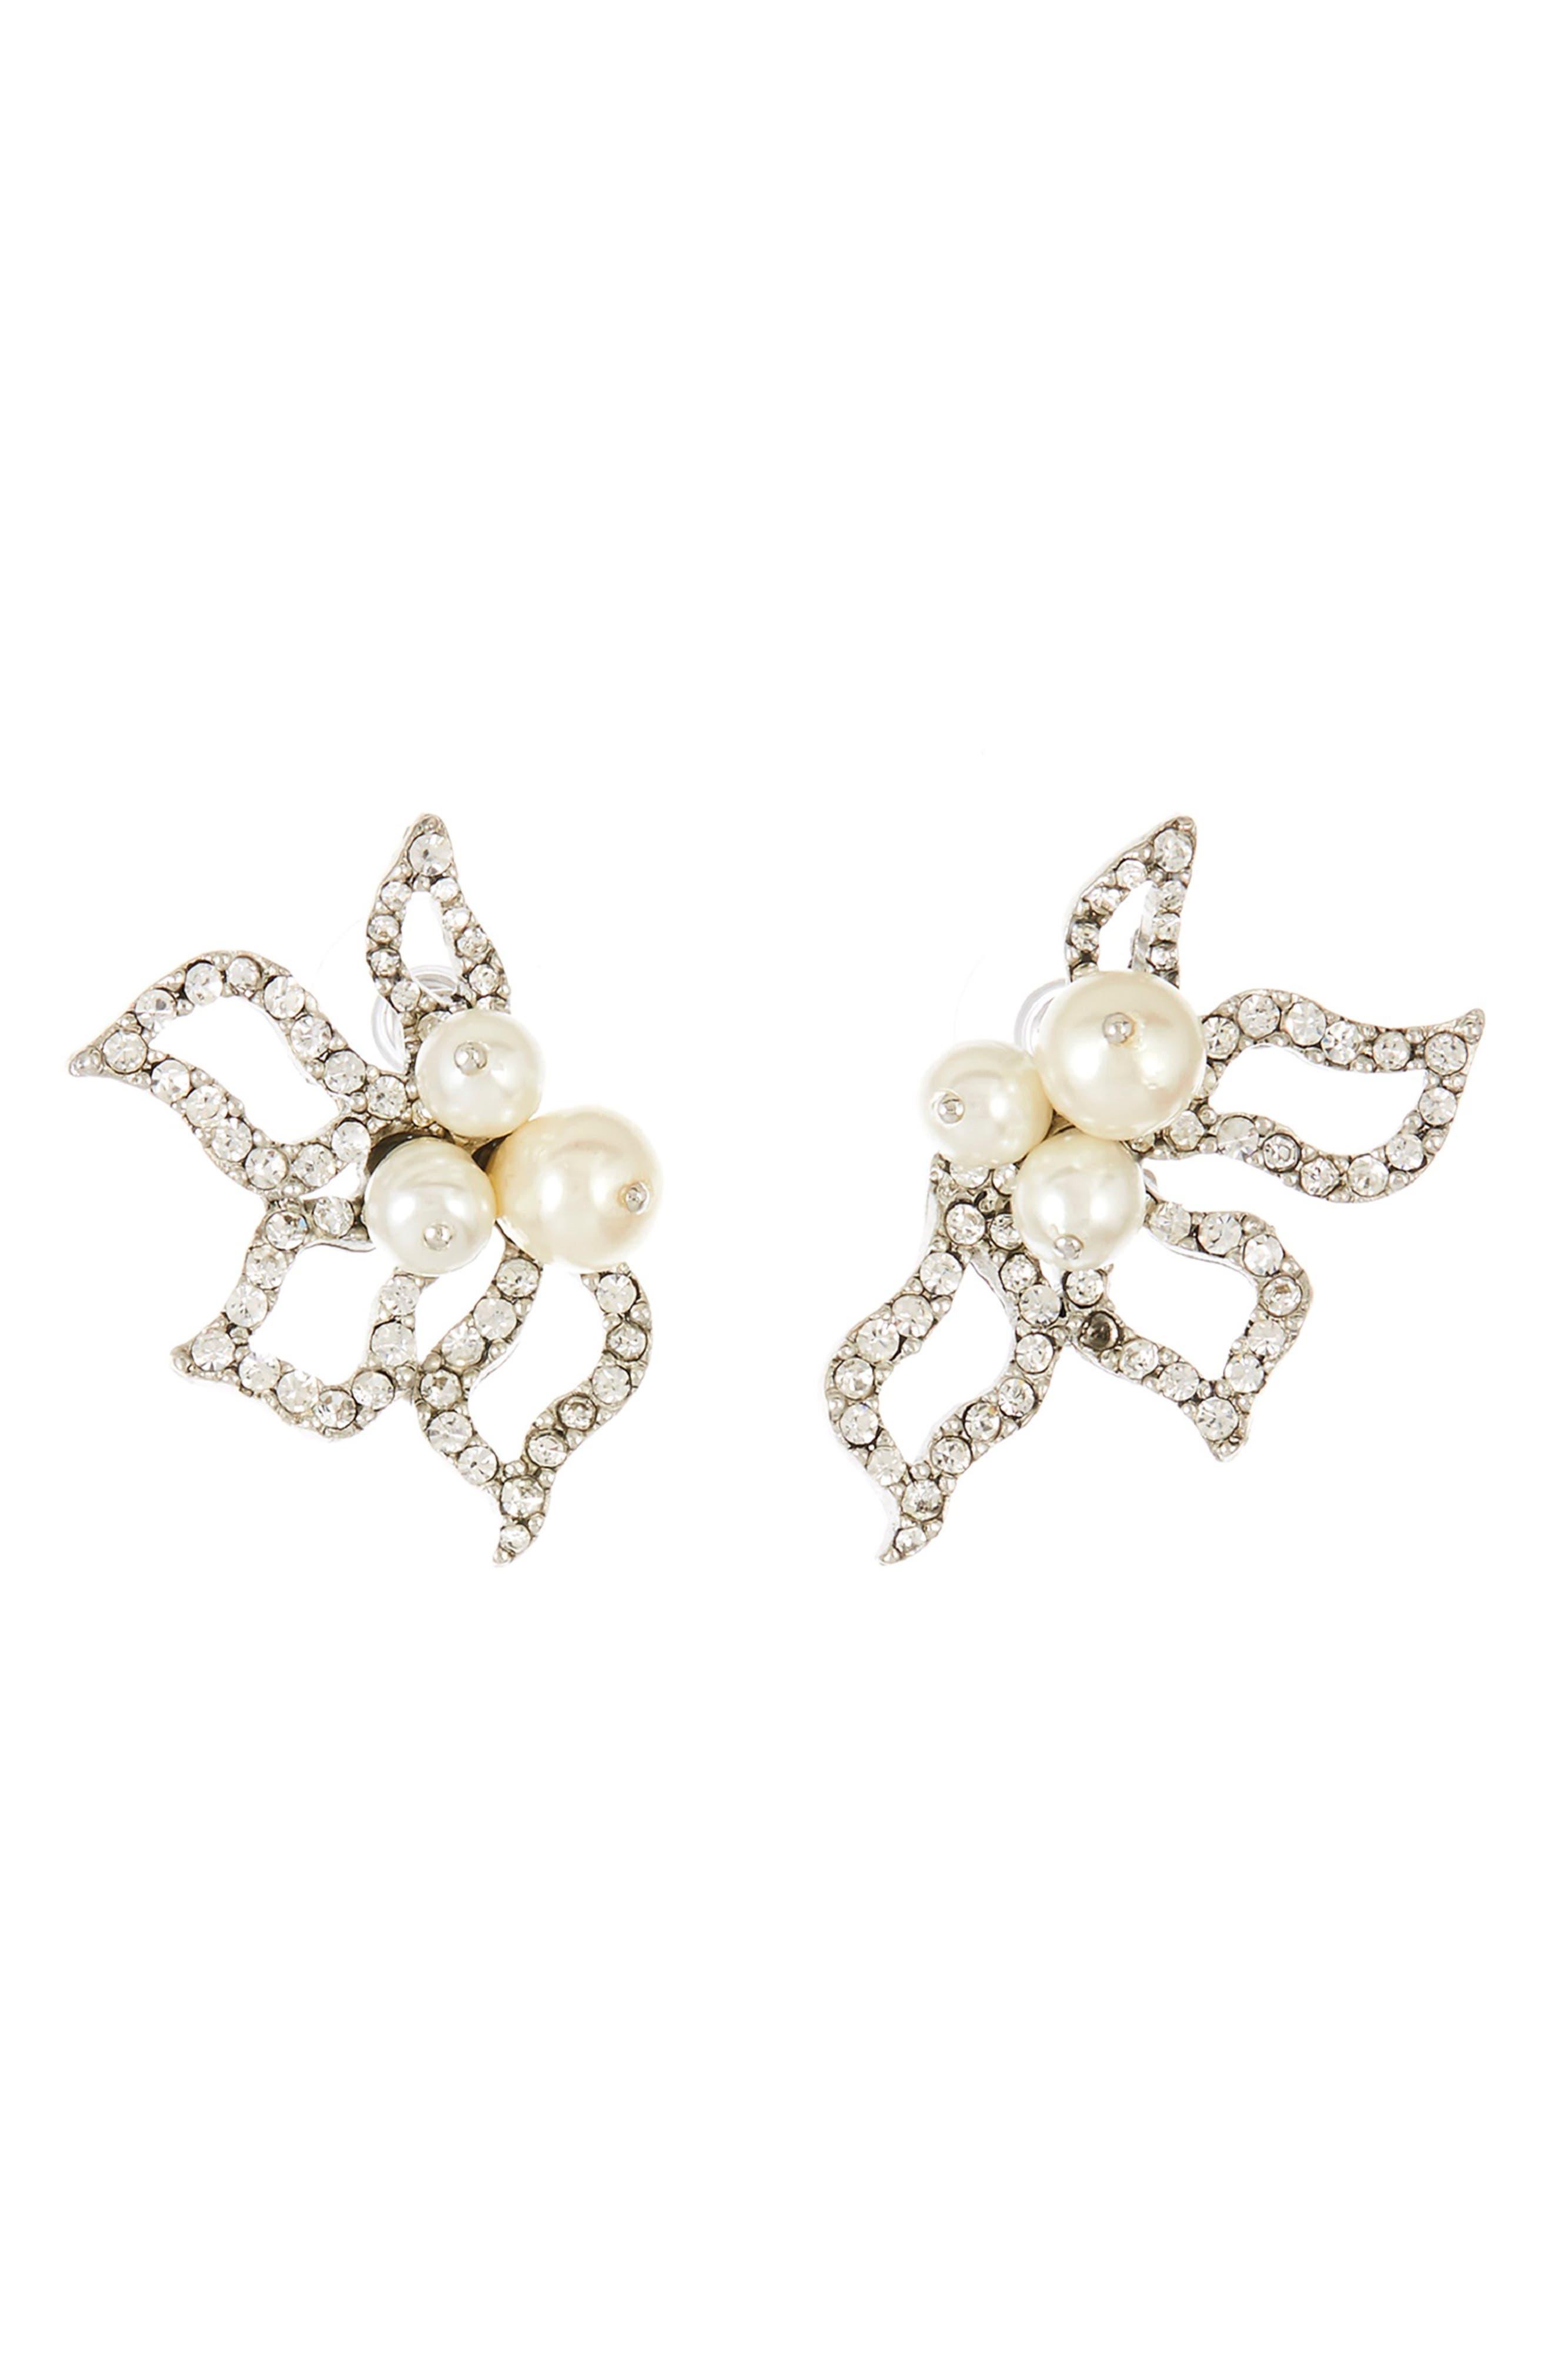 Imitation Pearl Pavé Earrings,                             Main thumbnail 1, color,                             SILVER